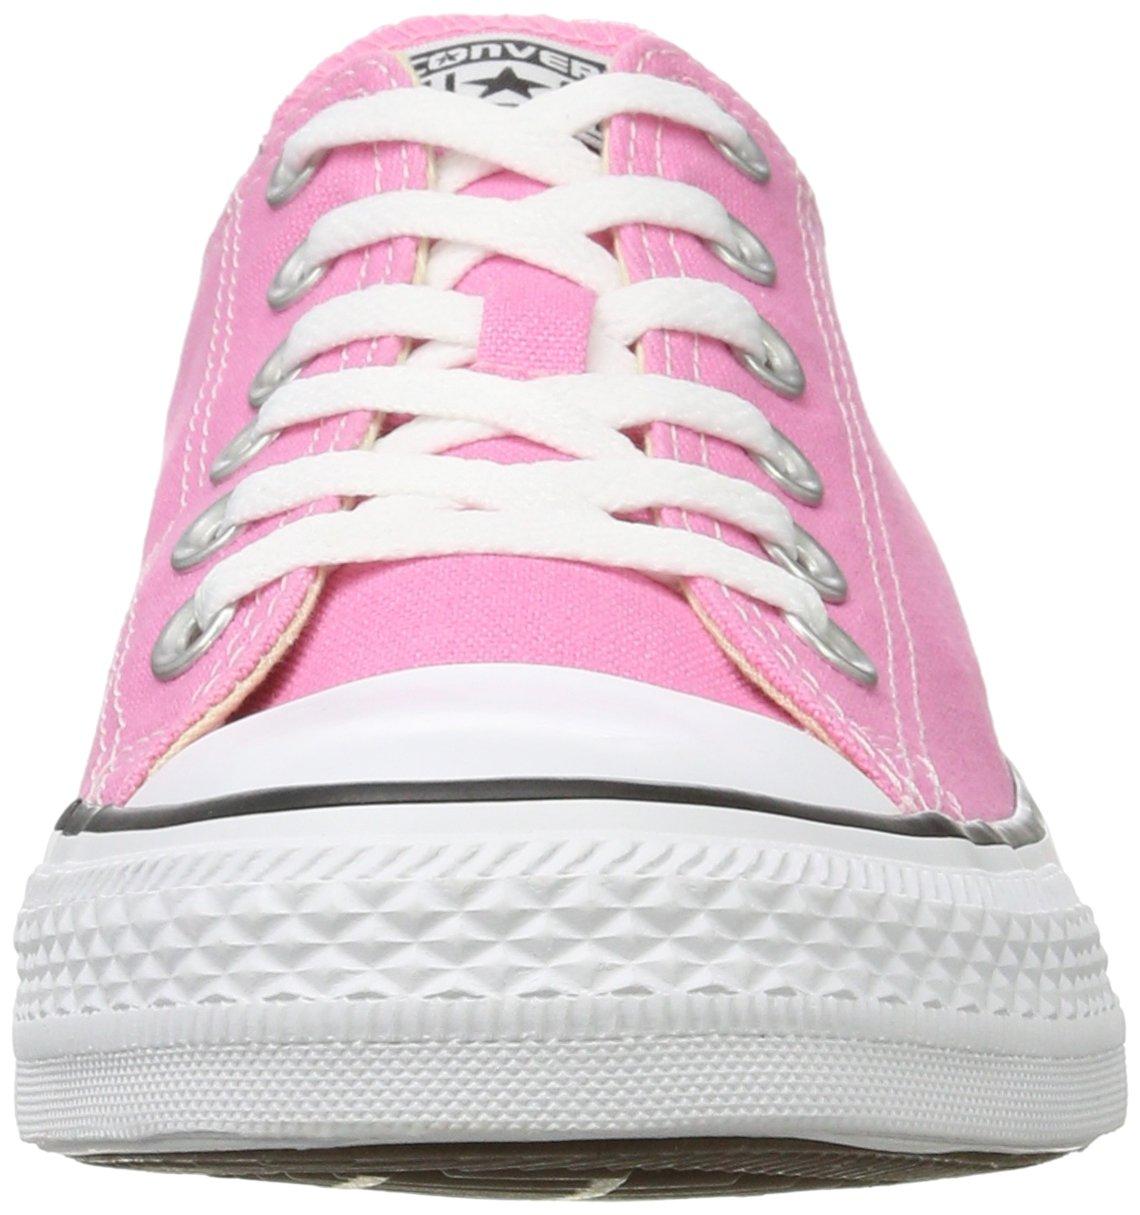 Converse Core Chuck Taylor All Star Core Converse Ox B00IVNEU18 M6.5W8.5|Pink 43a099